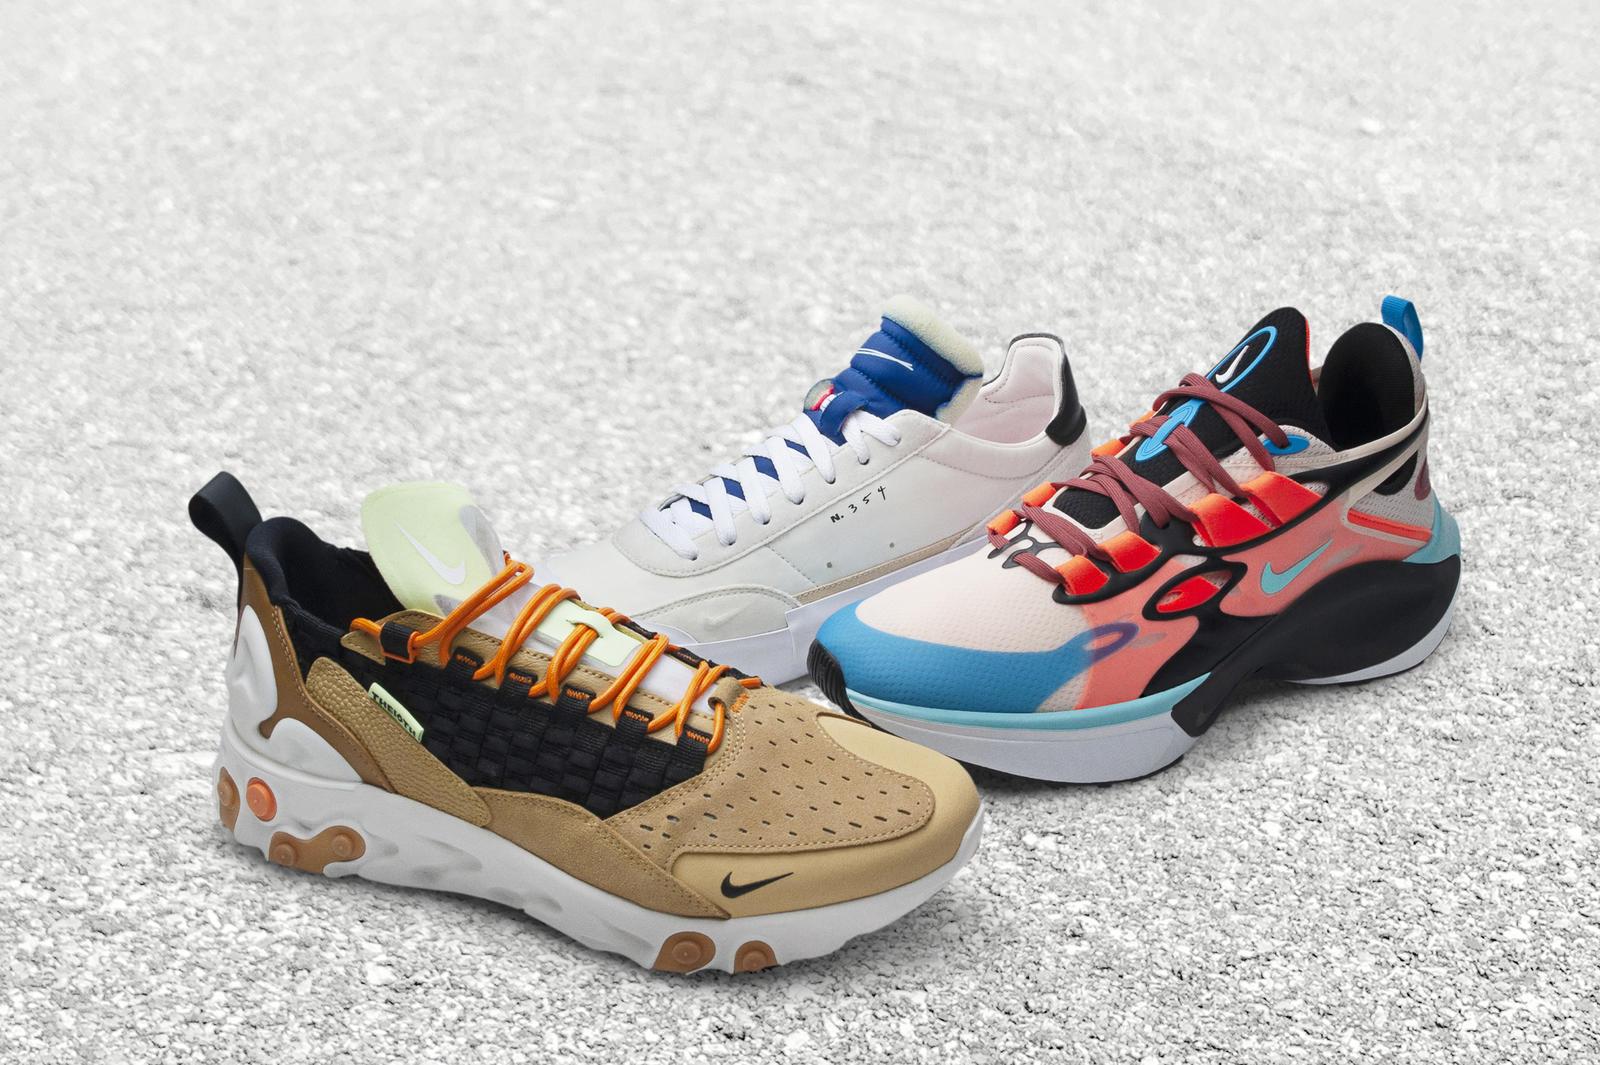 Nike Sportswear N. 354, THE10TH and DIMSIX Footwear 3